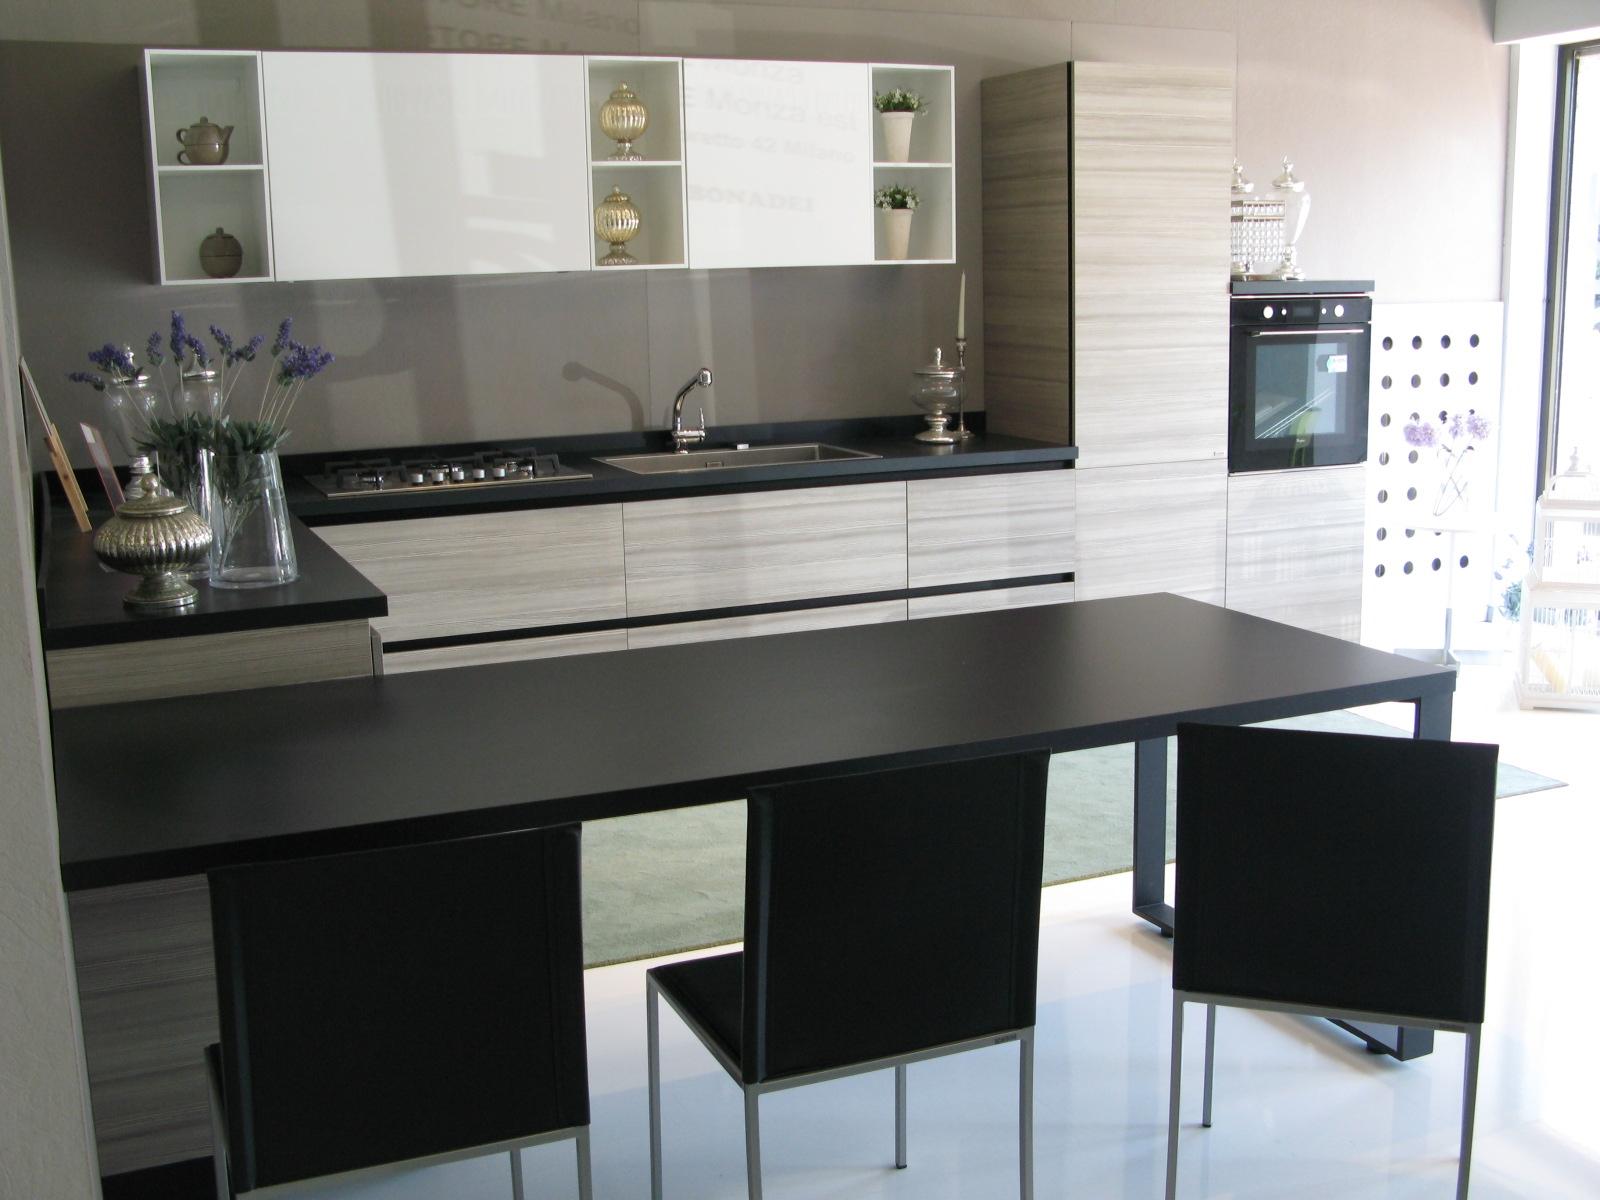 Scavolini offertissima outlet mod liberamente cucine a prezzi scontati - Costi cucine scavolini ...